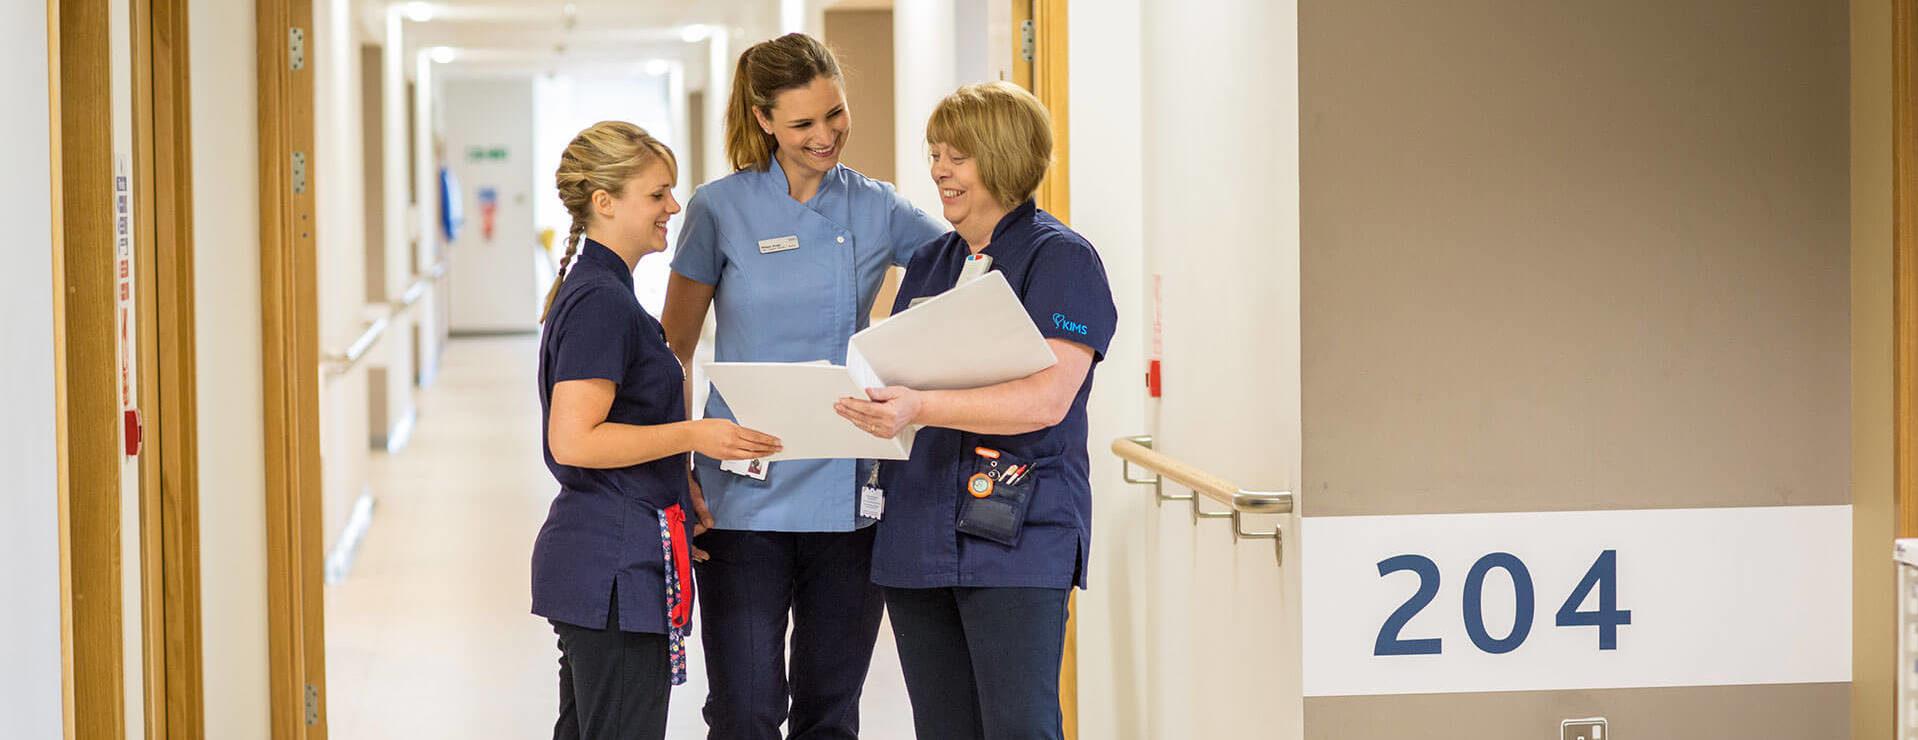 Self-pay treatment | KIMS Hospital